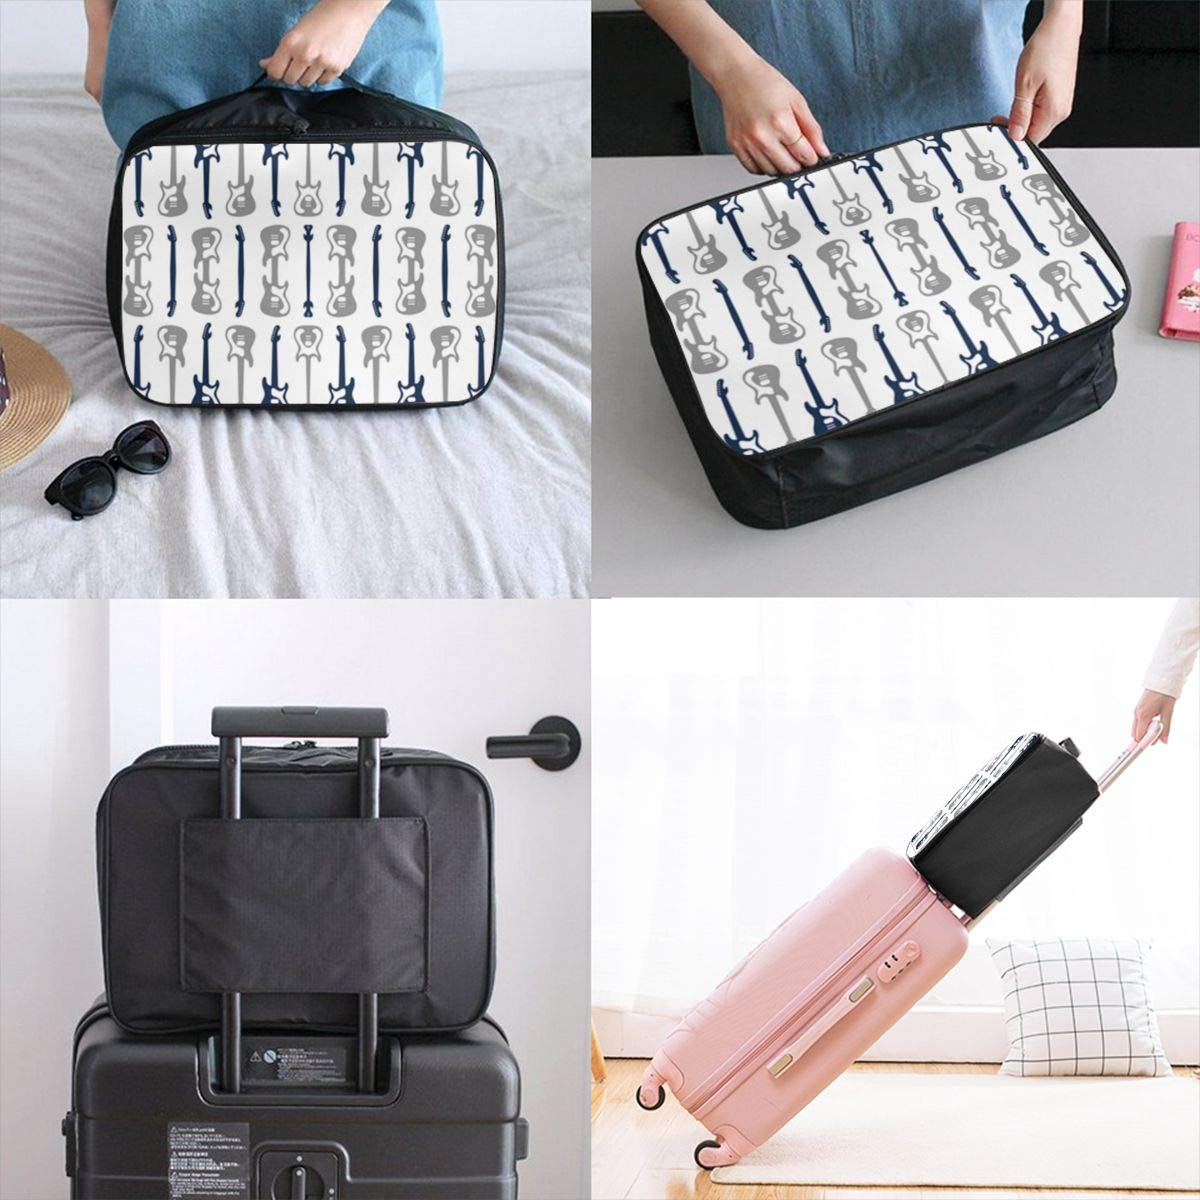 ADGAI Rock Music Guitar Navy Canvas Travel Weekender Bag,Fashion Custom Lightweight Large Capacity Portable Luggage Bag,Suitcase Trolley Bag